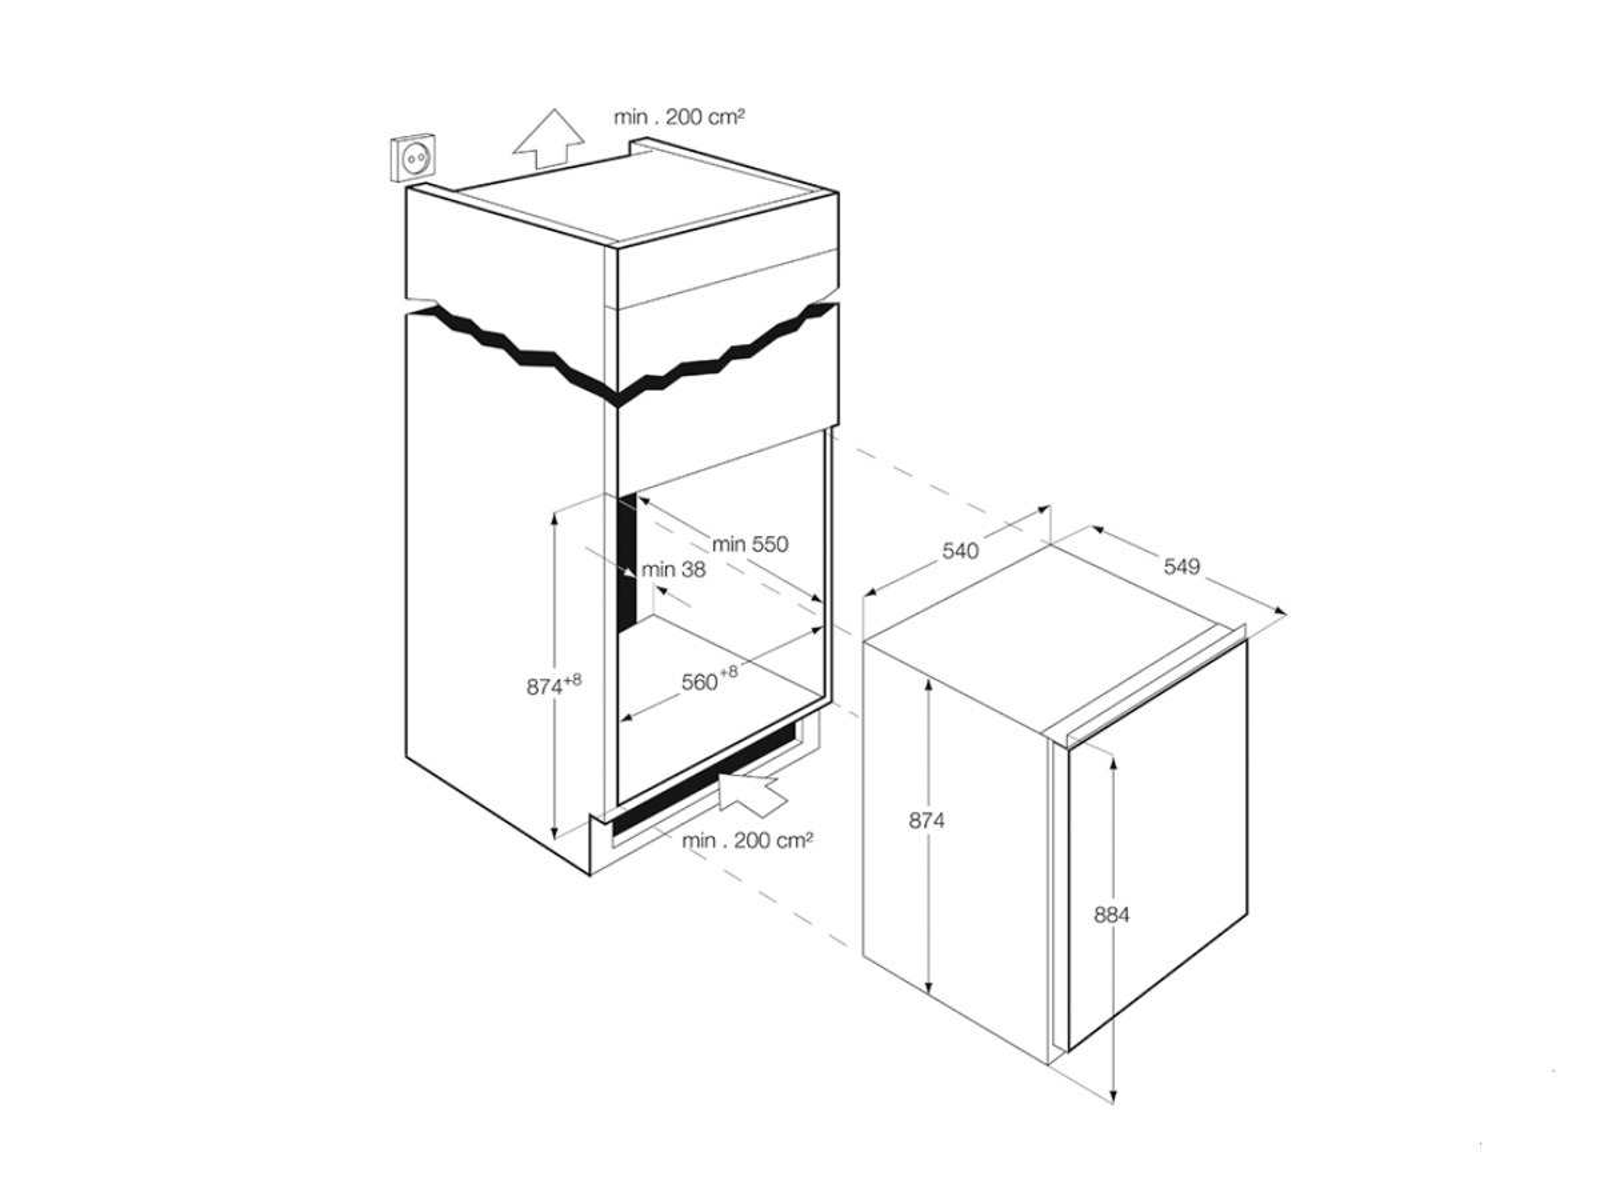 aeg ags88800f0 einbau gefrierschrank f r 668 90 eur shop. Black Bedroom Furniture Sets. Home Design Ideas